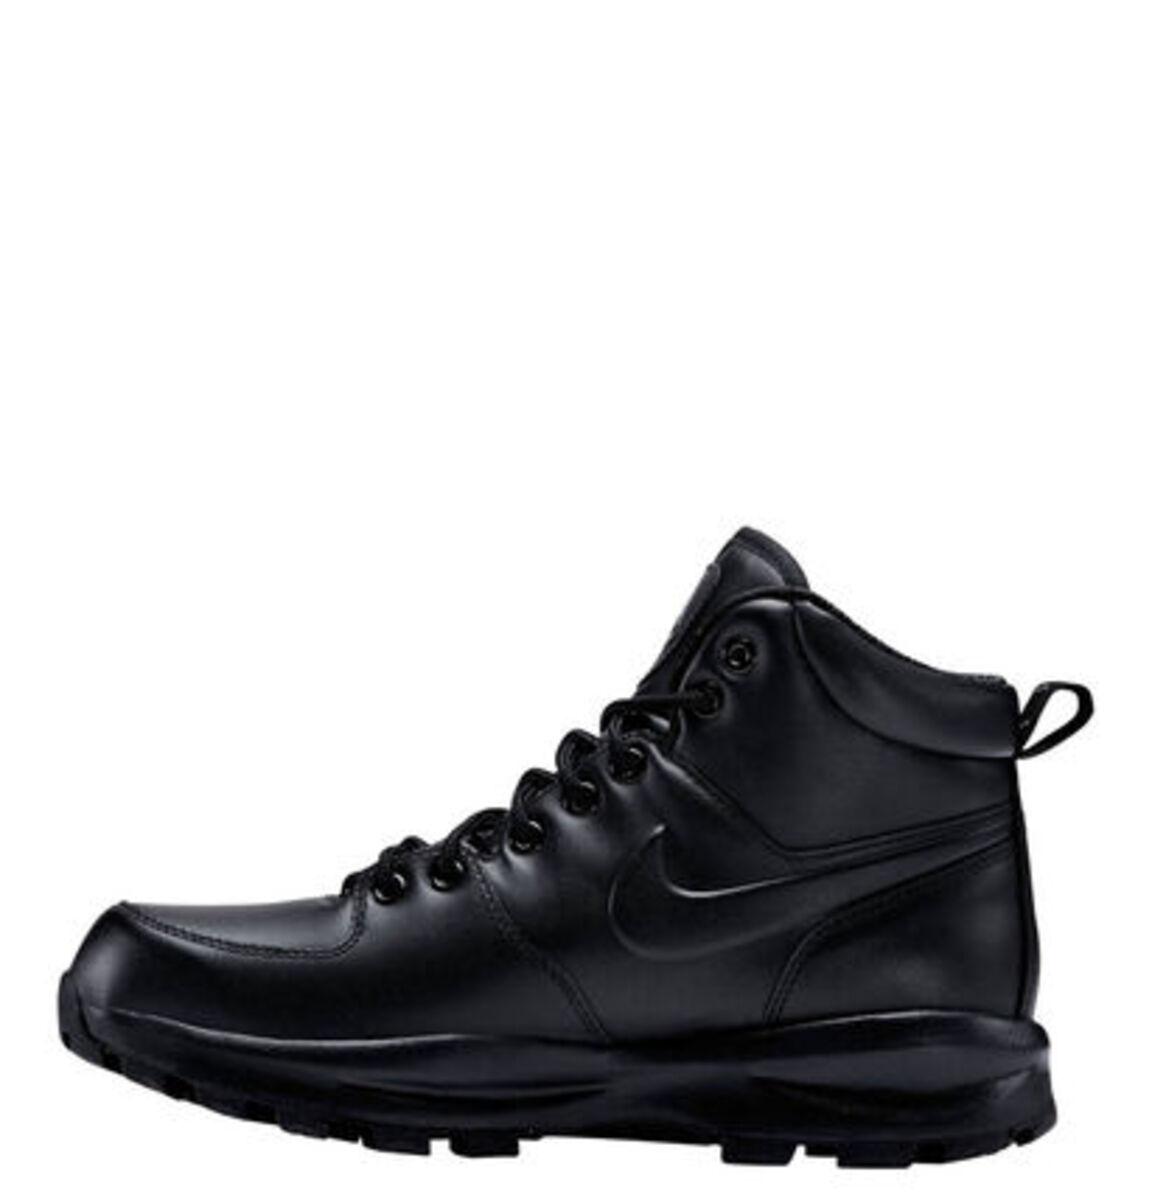 Bild 3 von Nike Herren Boots Manoa